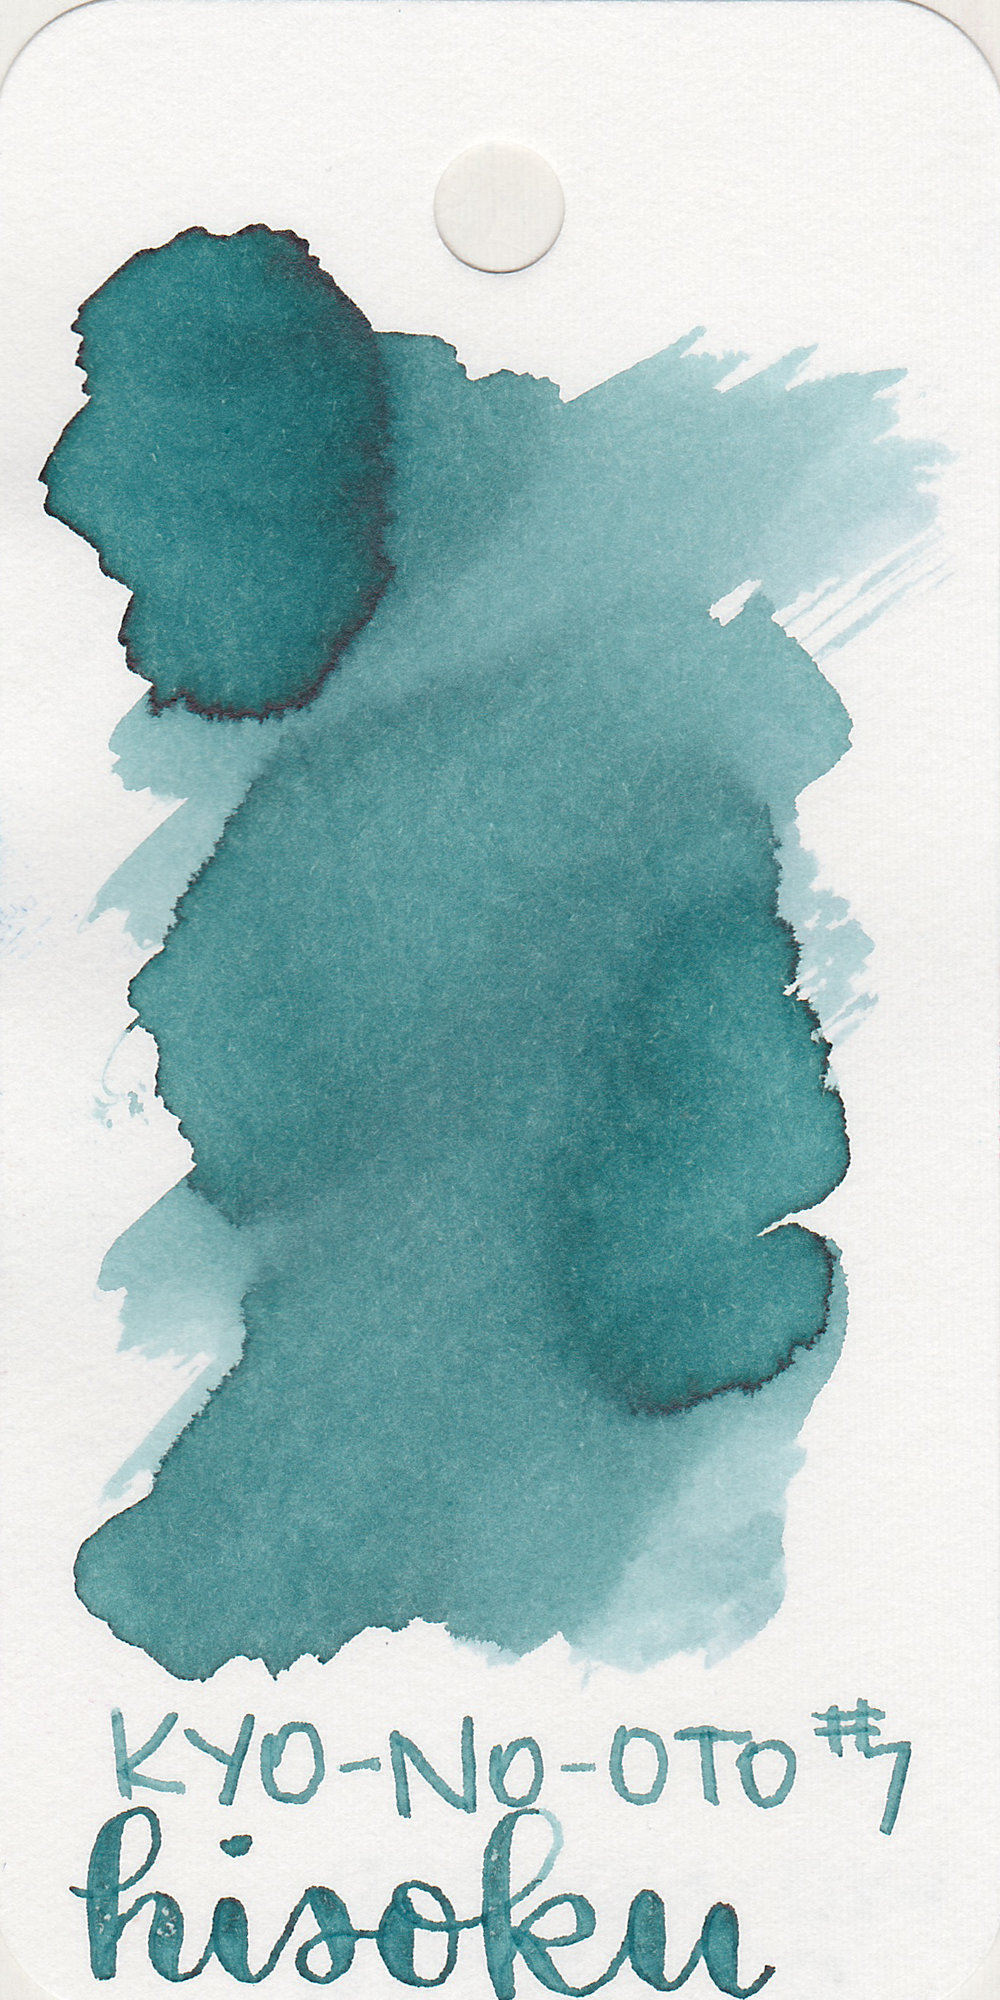 kyo-hisoku-1.jpg